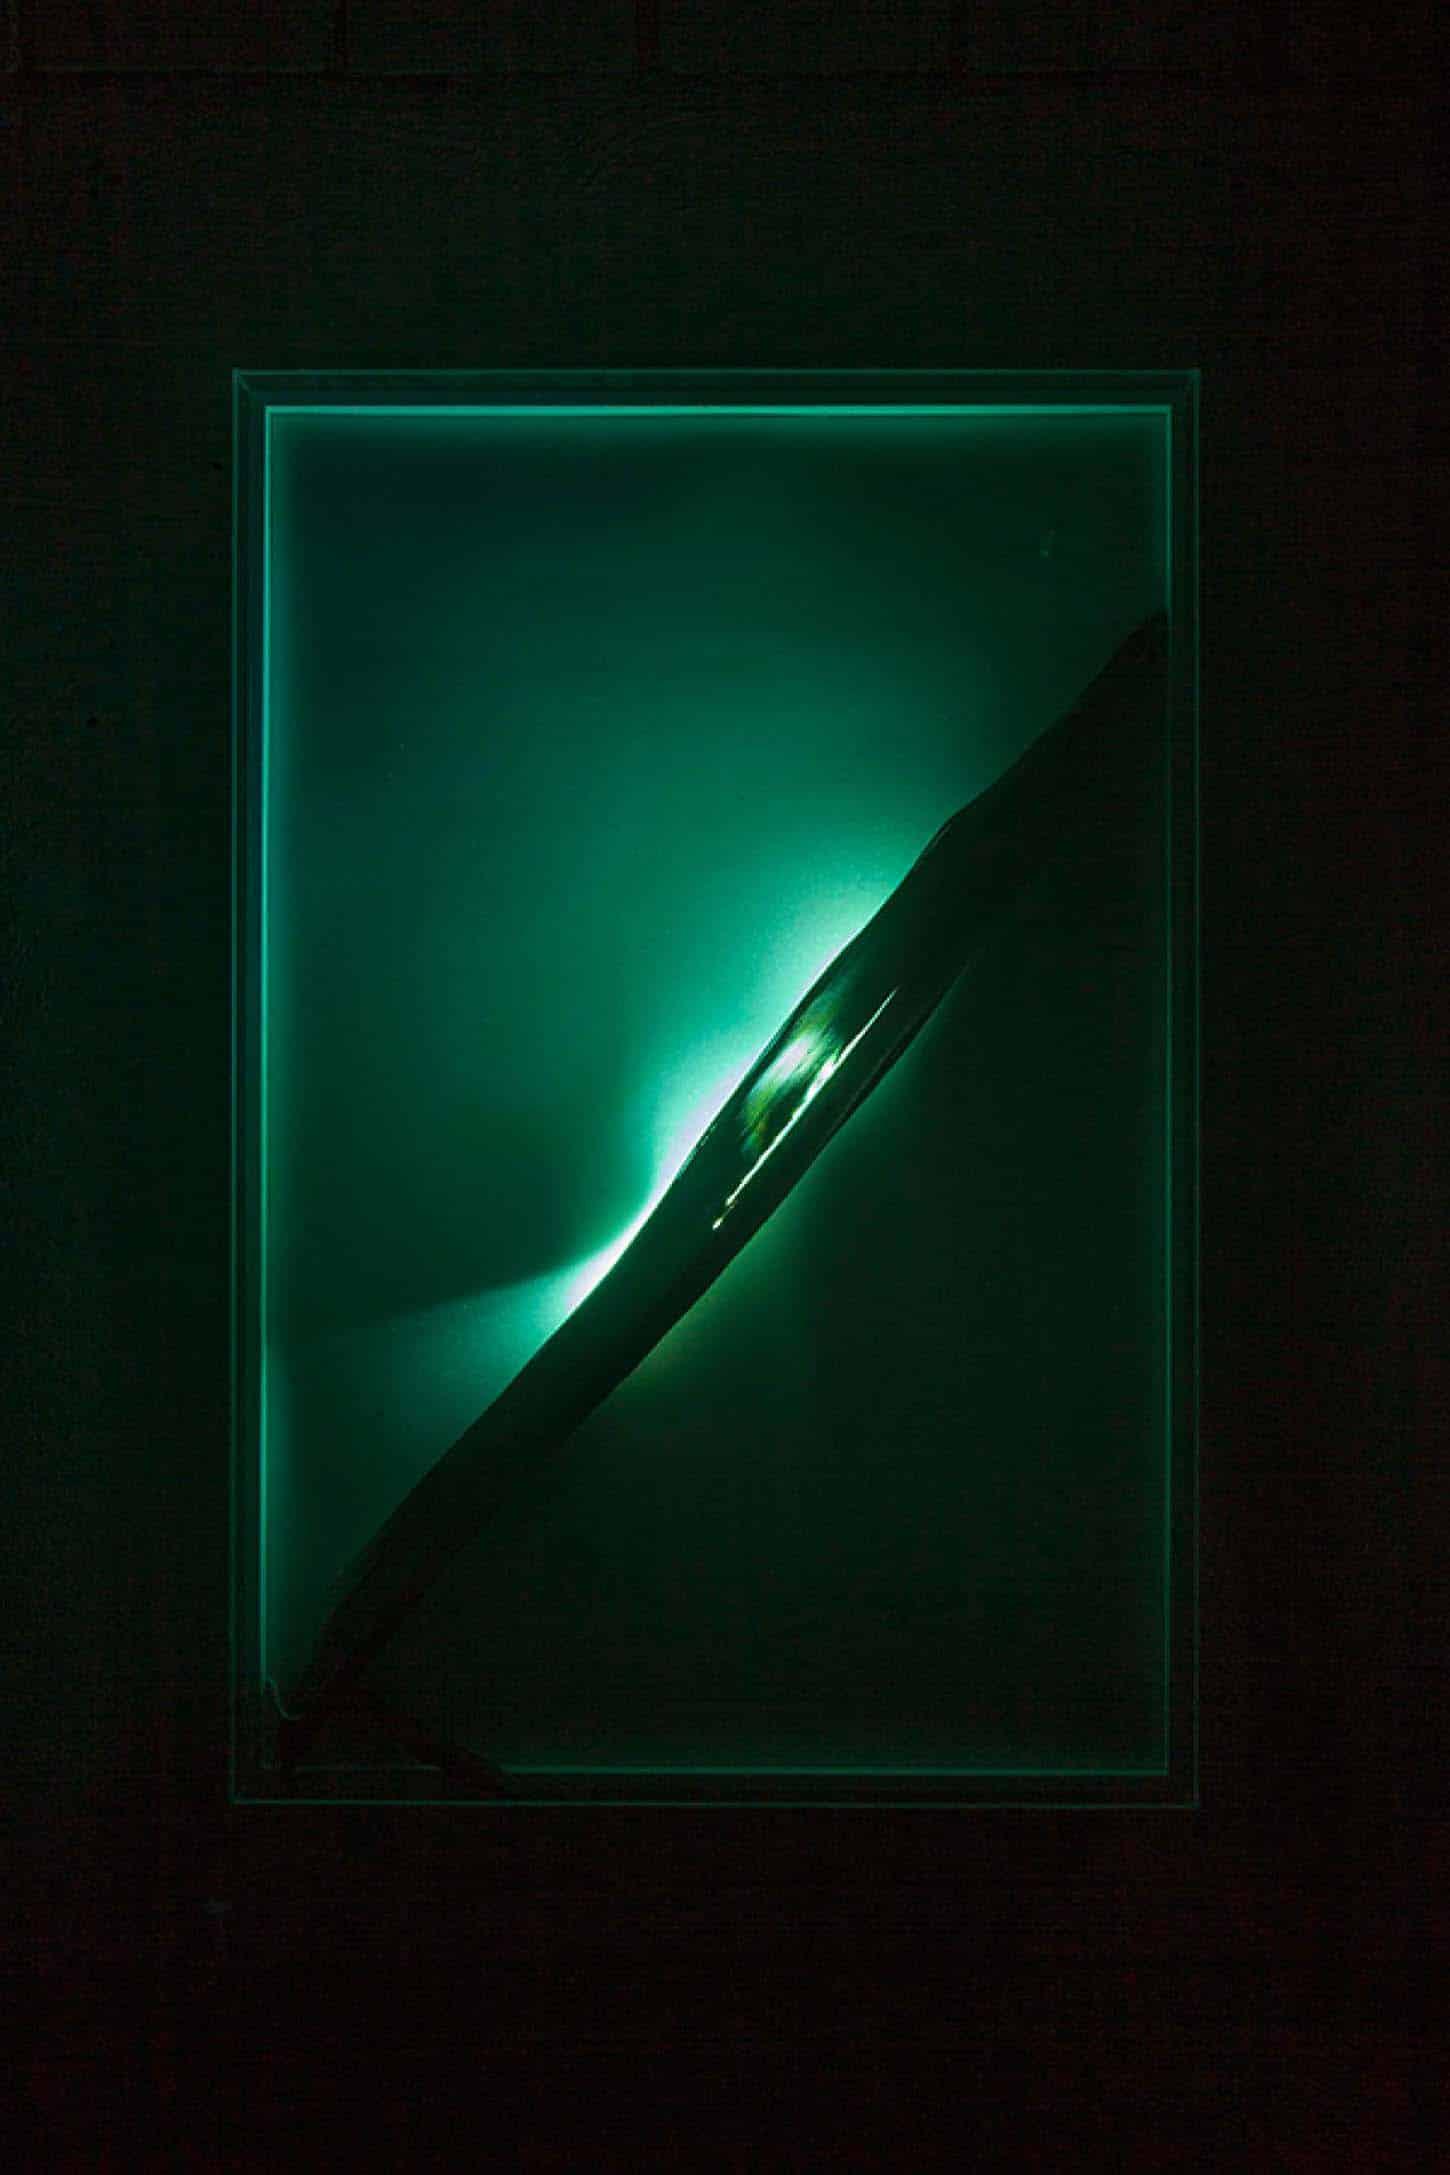 Espace A VENDRE. Eva Medin - SolsticeYuca 2Mousse, feuille de yuka, lumière, dispositif lumineux, cadre en plexiglas